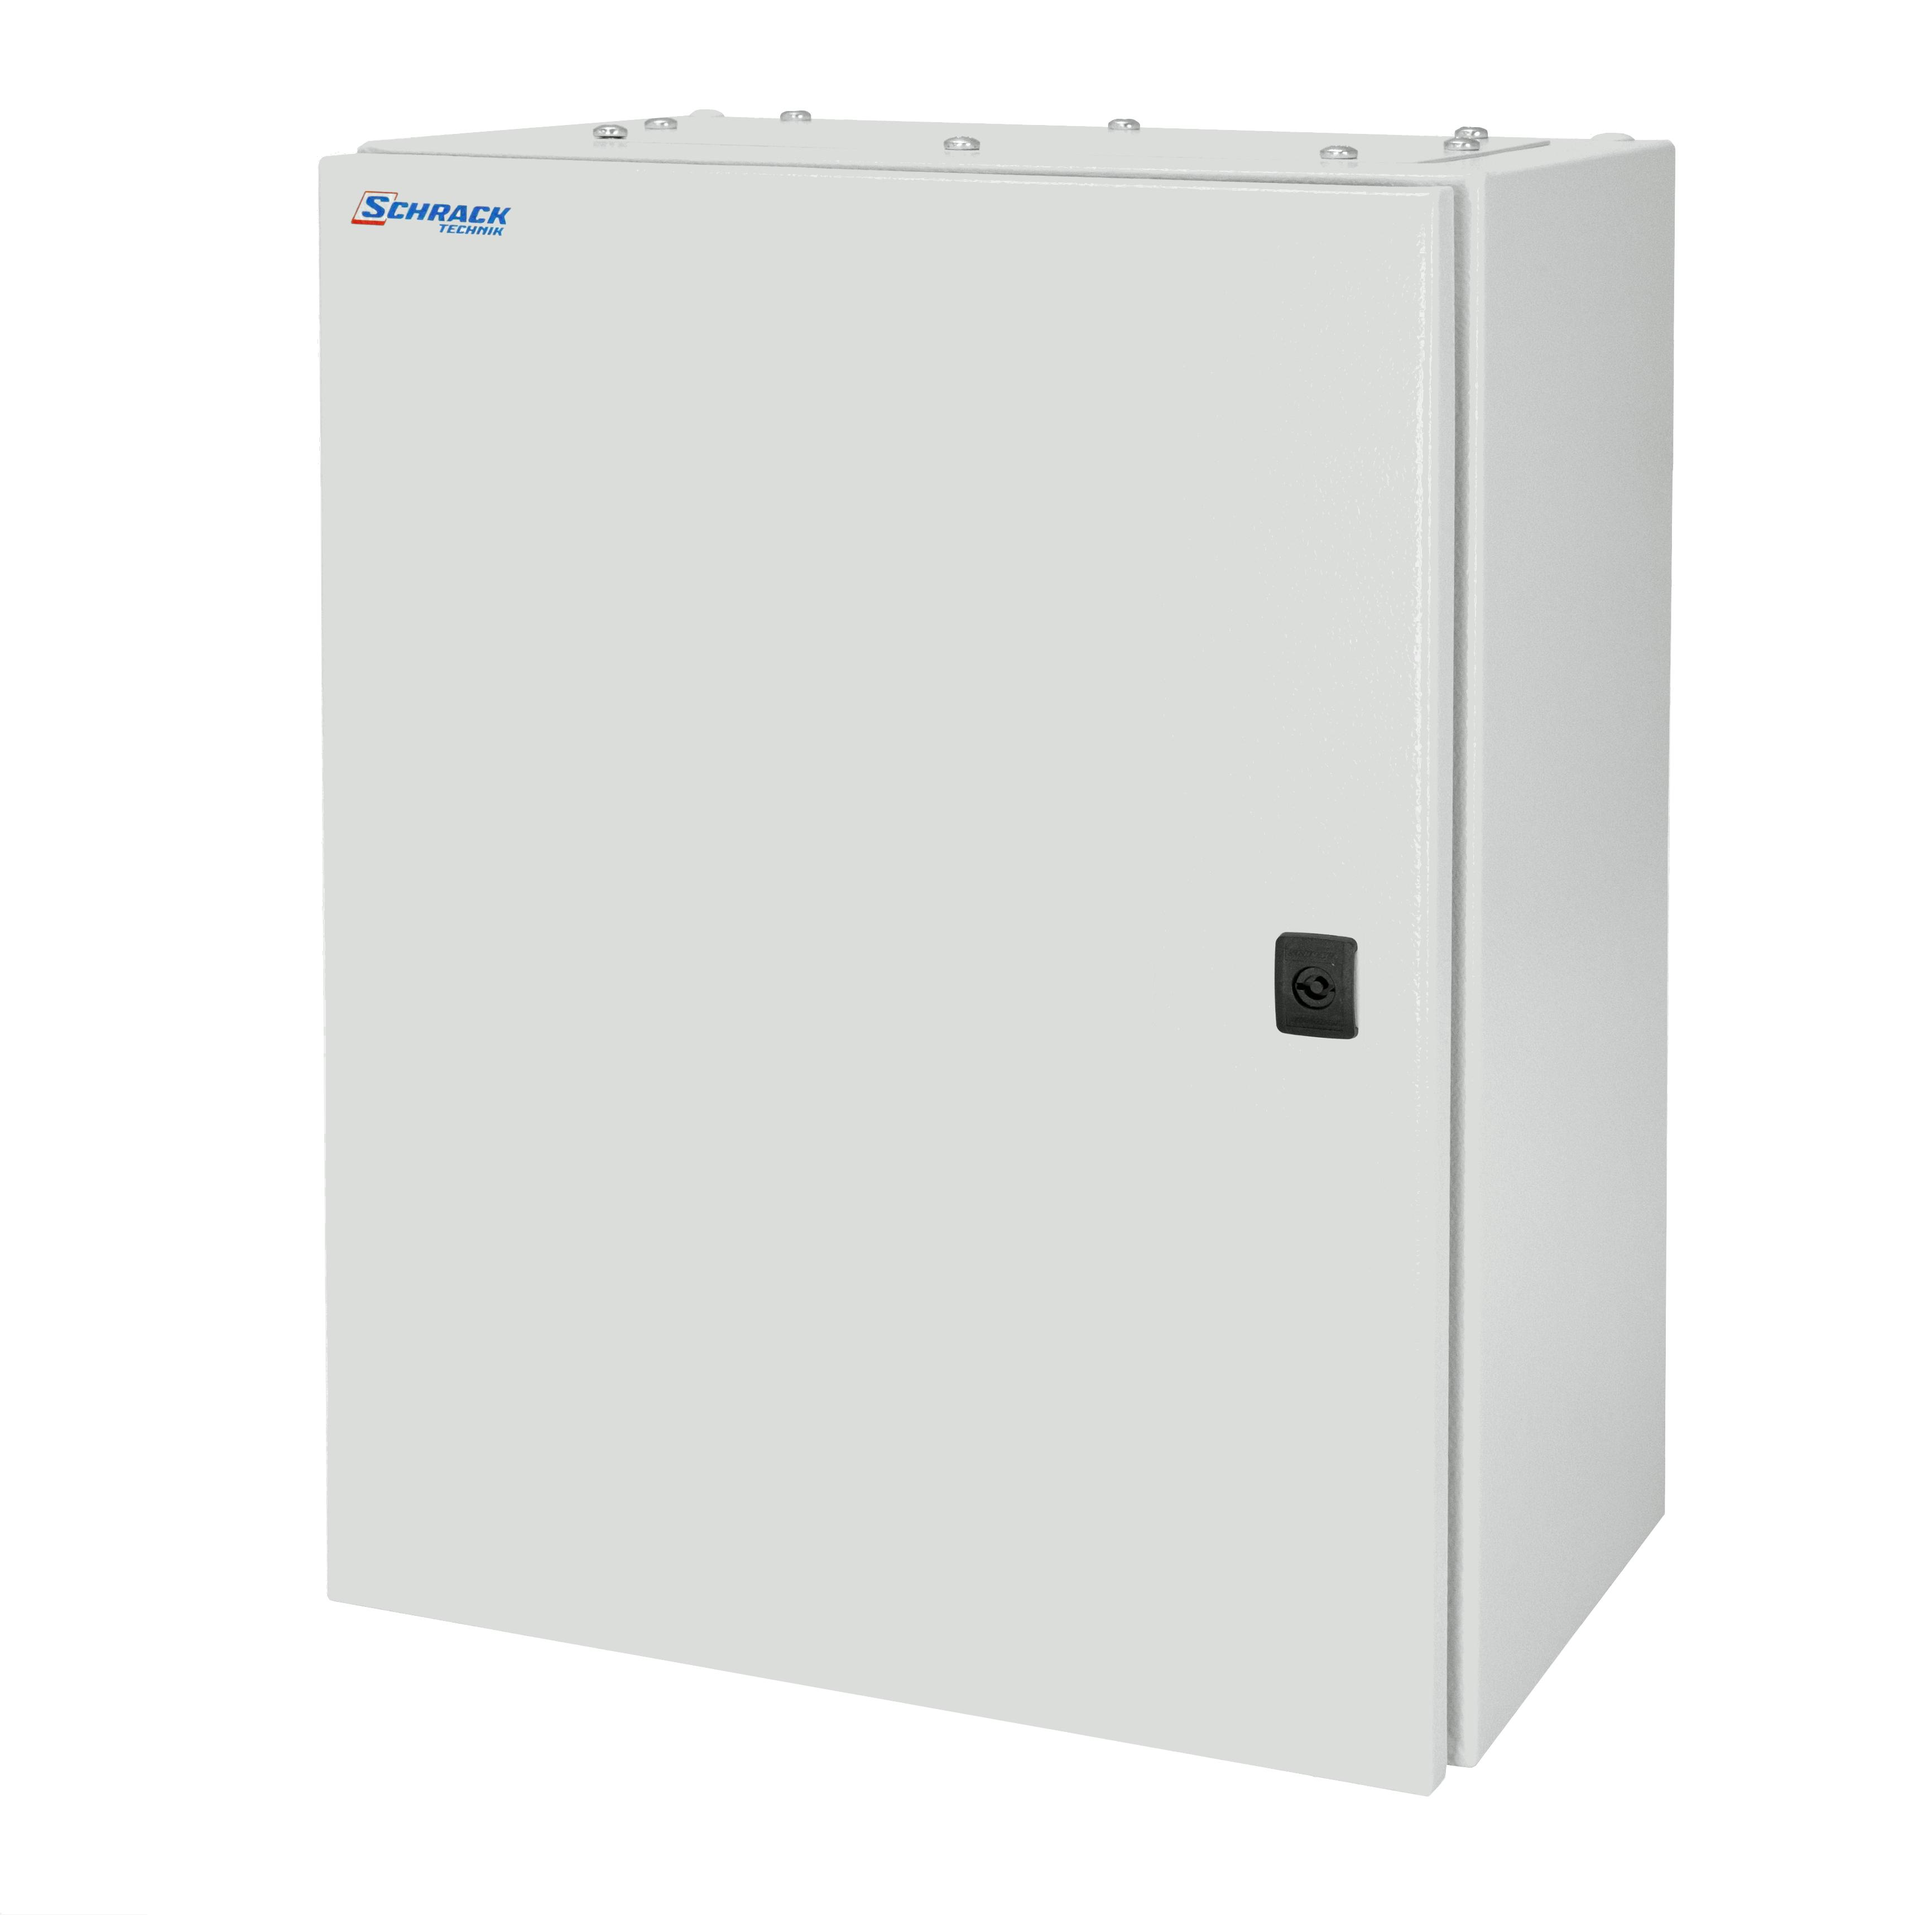 1 Stk Wandschrank Mono IP66 H=400 B=300 T=155 Stahlblech WSM4030150